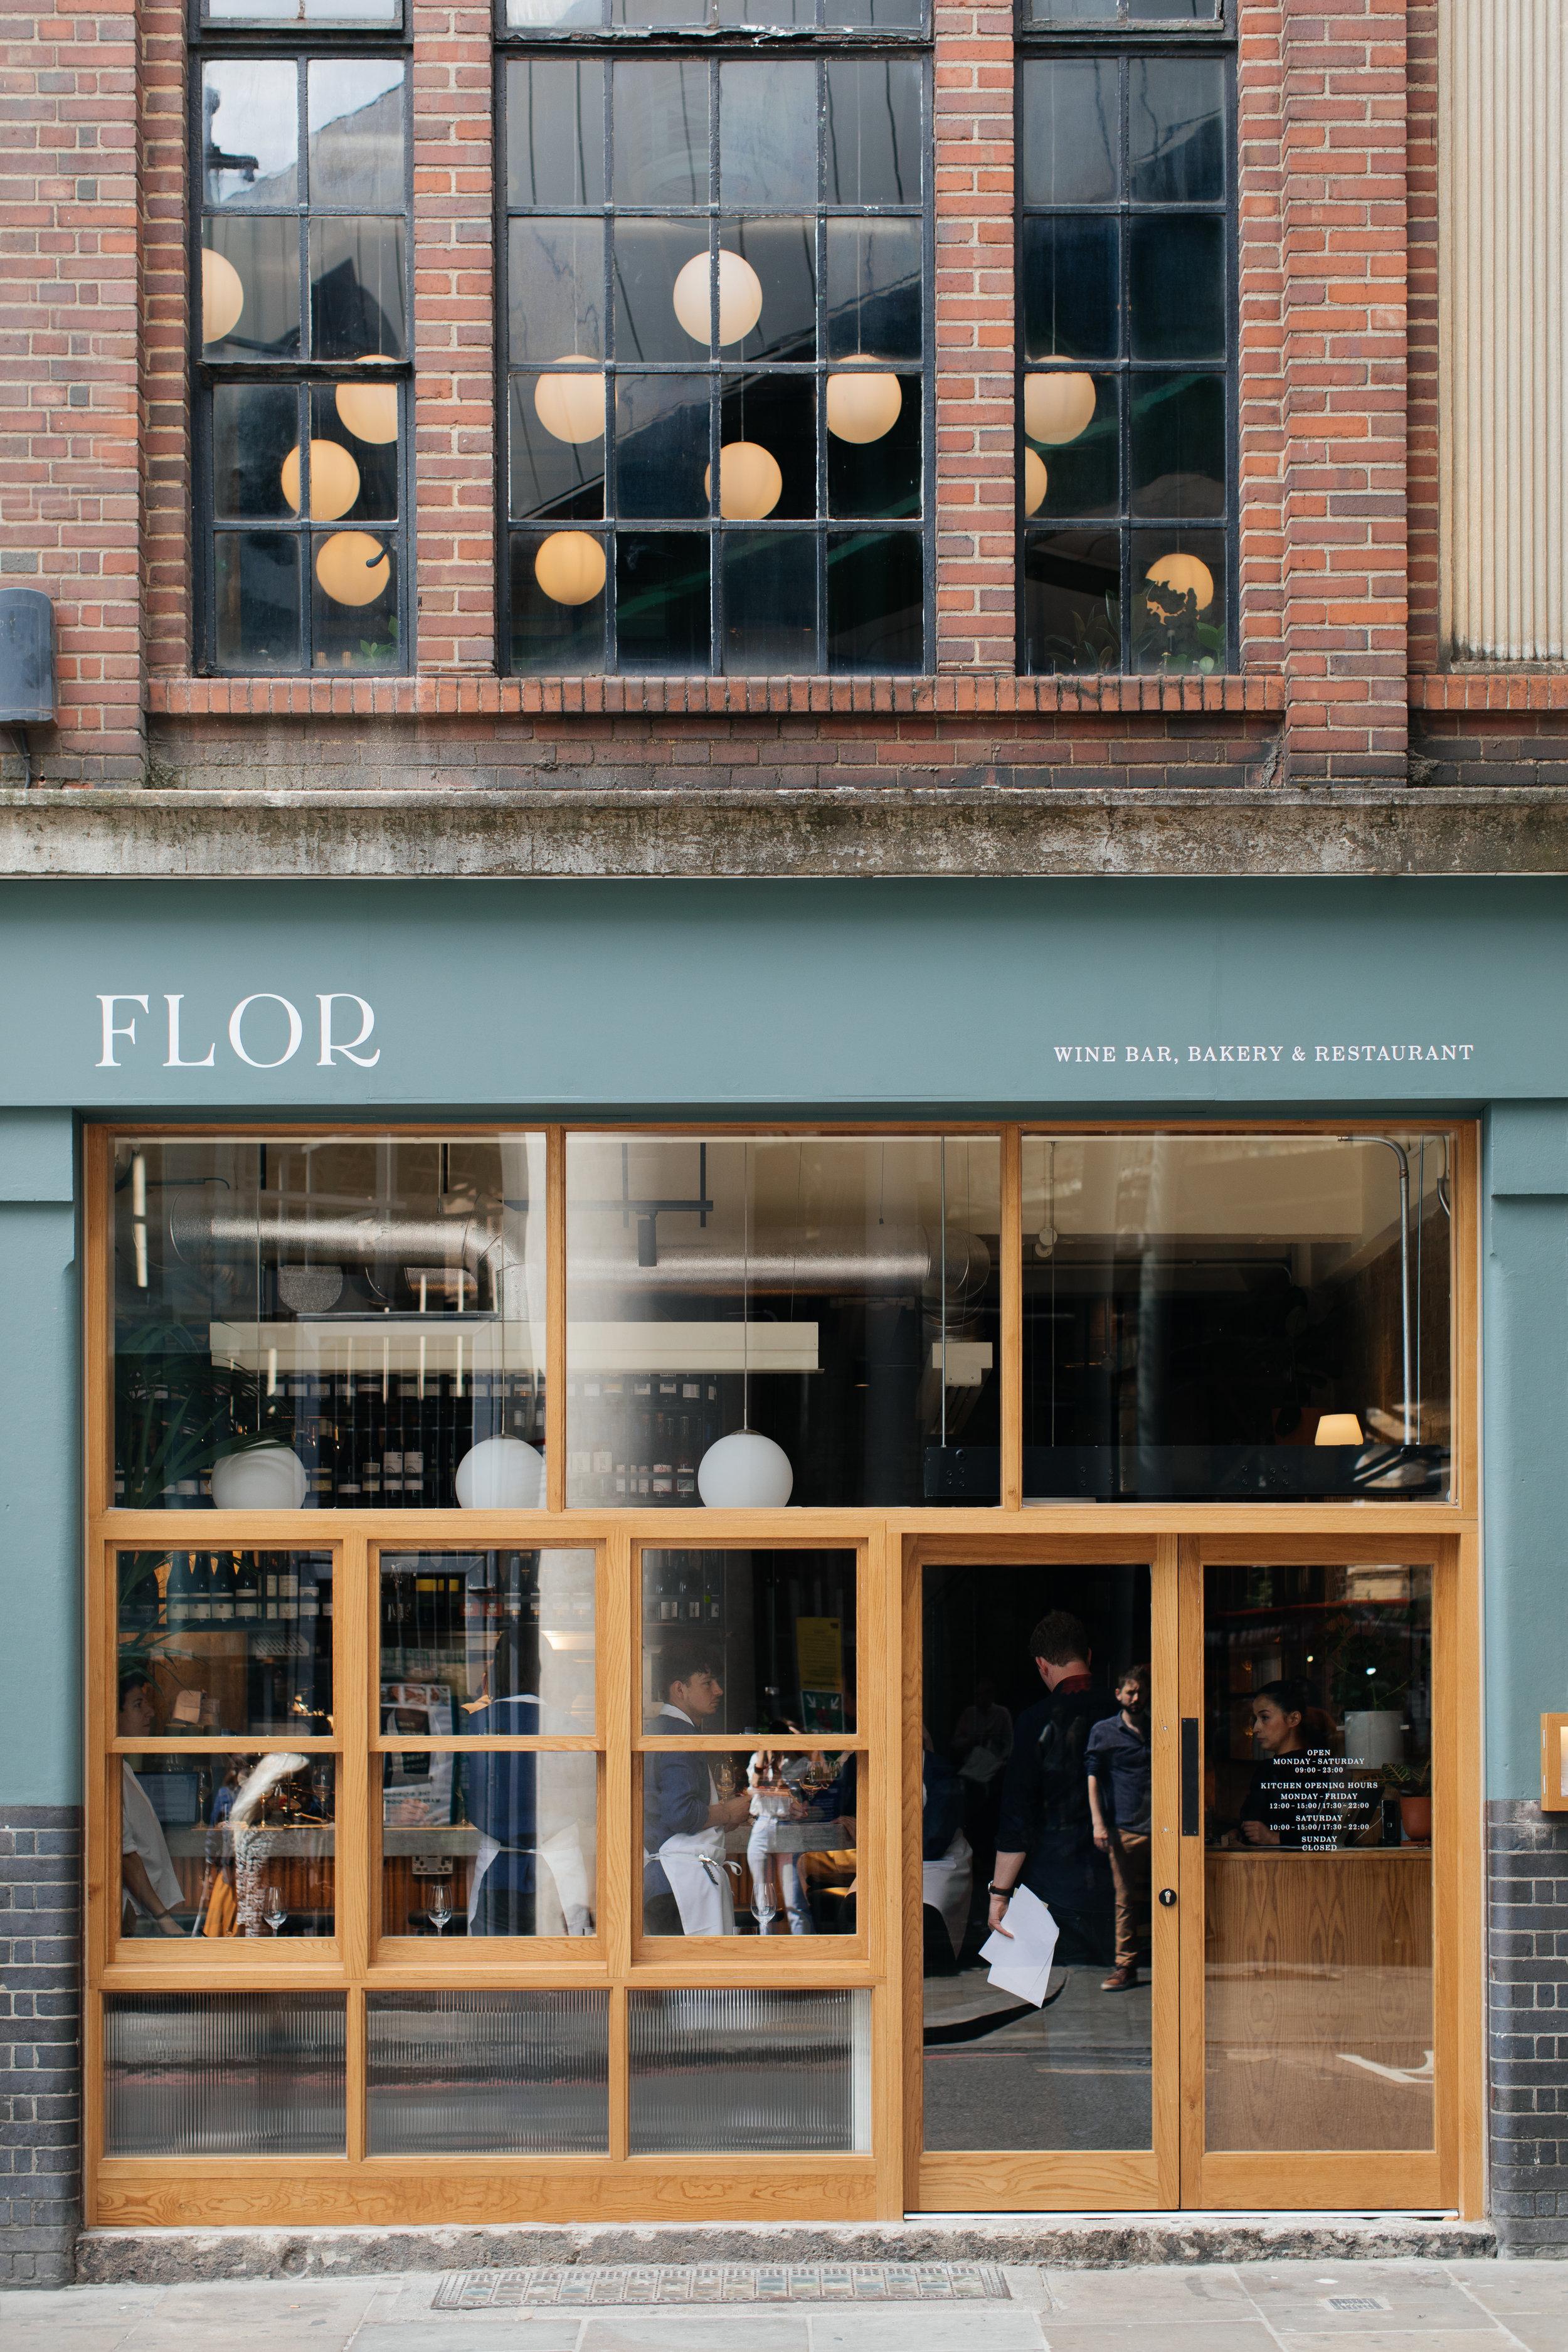 Images courtesy of Flor London.